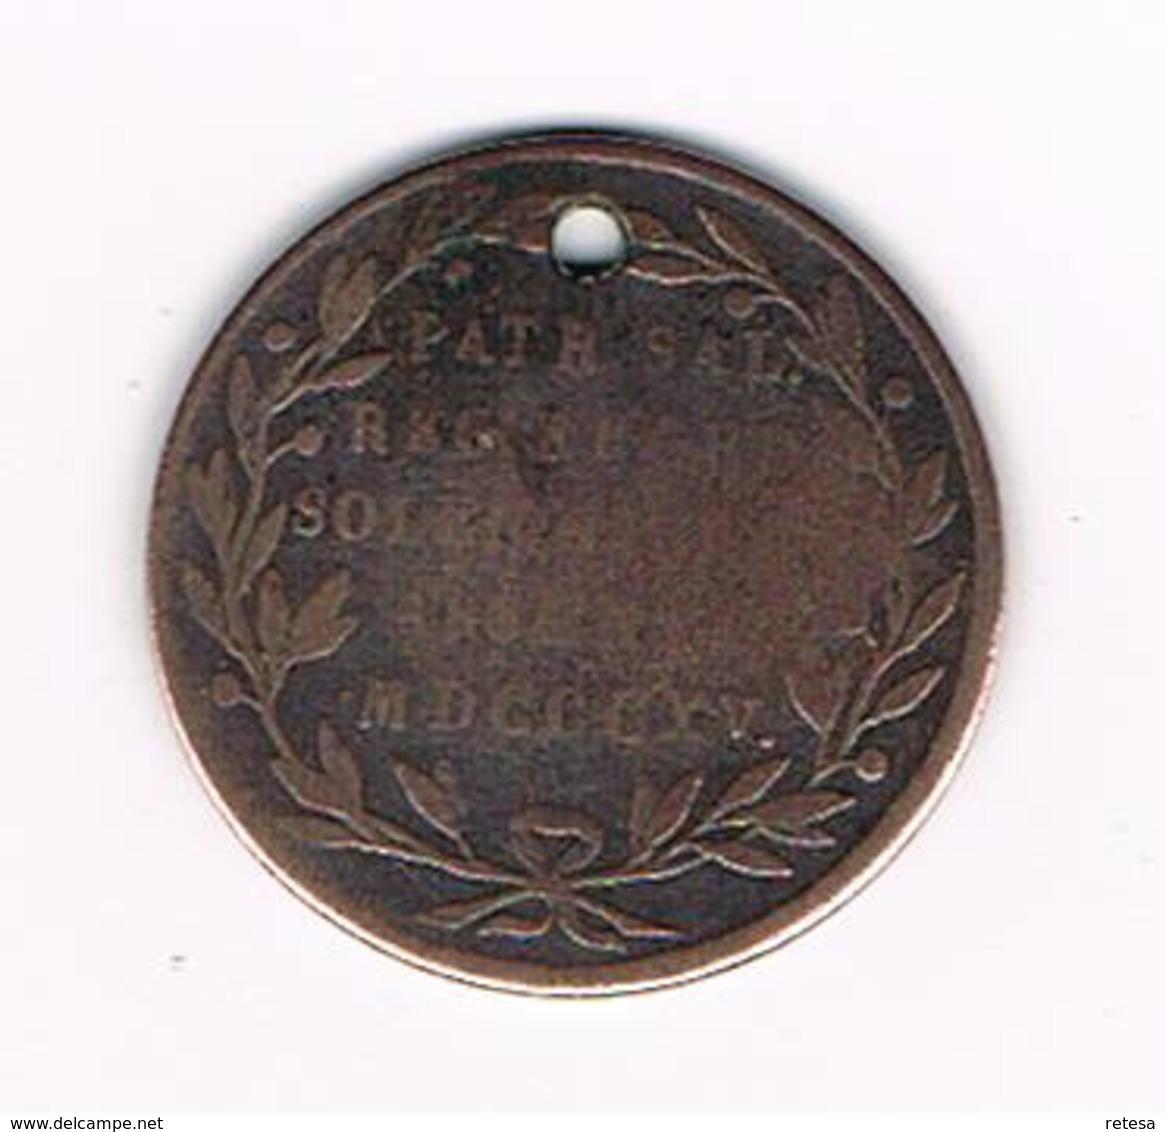 //  HERDENKINGSMUNT WILH.NASS.BELG.REX.LUXEMB.M.DUX MDCCCXV. ( 1815 ) - Pièces écrasées (Elongated Coins)